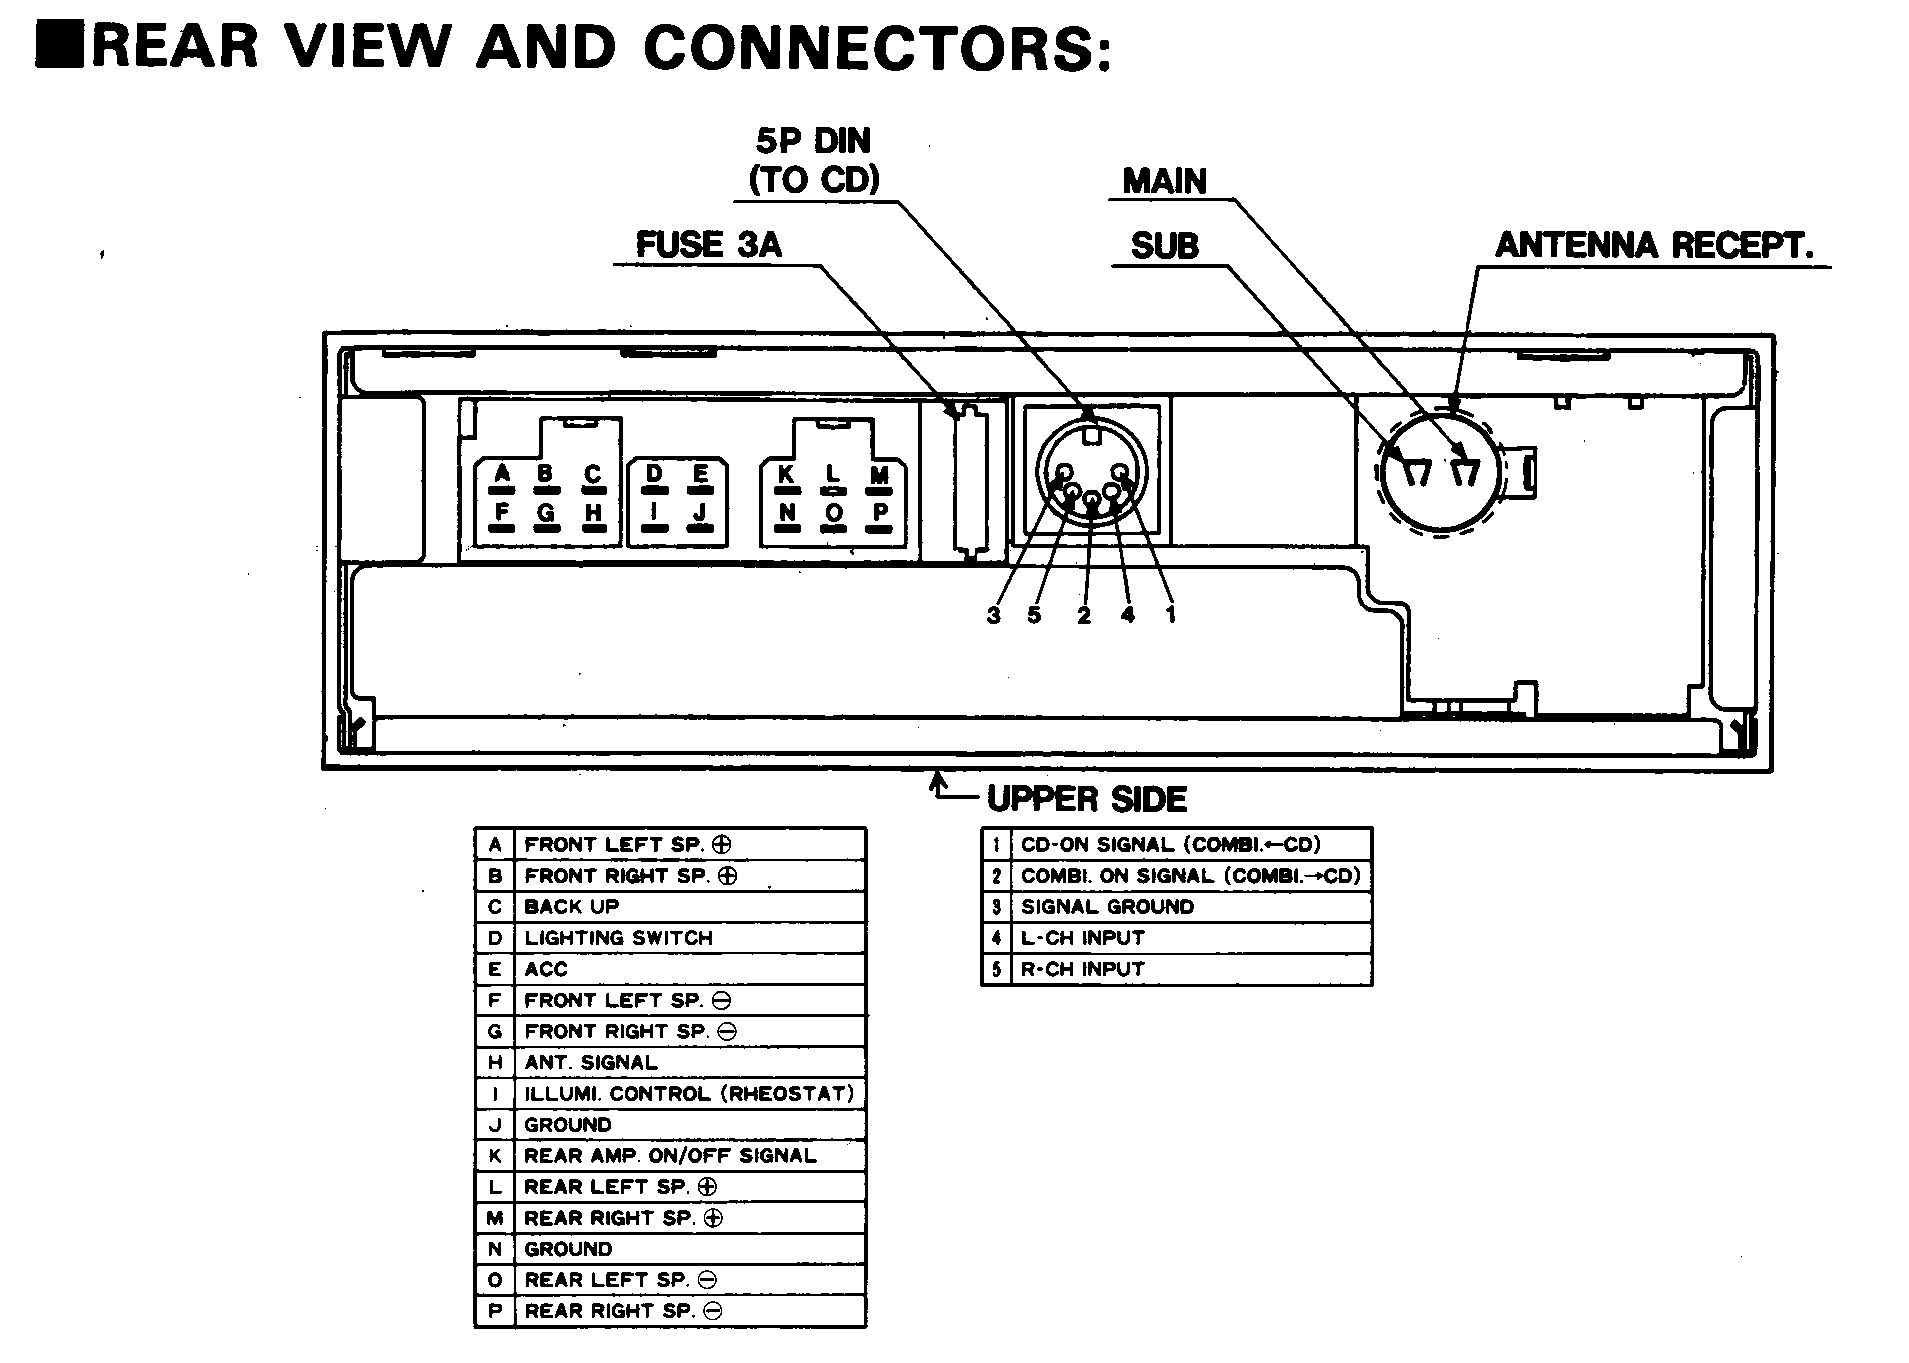 WireHarnessNis03180201?zoom\\\\\\\=2.625\\\\\\\&resize\\\\\\\=665%2C475 panasonic cq vd6505u wiring diagram kensun wiring diagram panasonic cq-vd6505u wiring diagram at panicattacktreatment.co